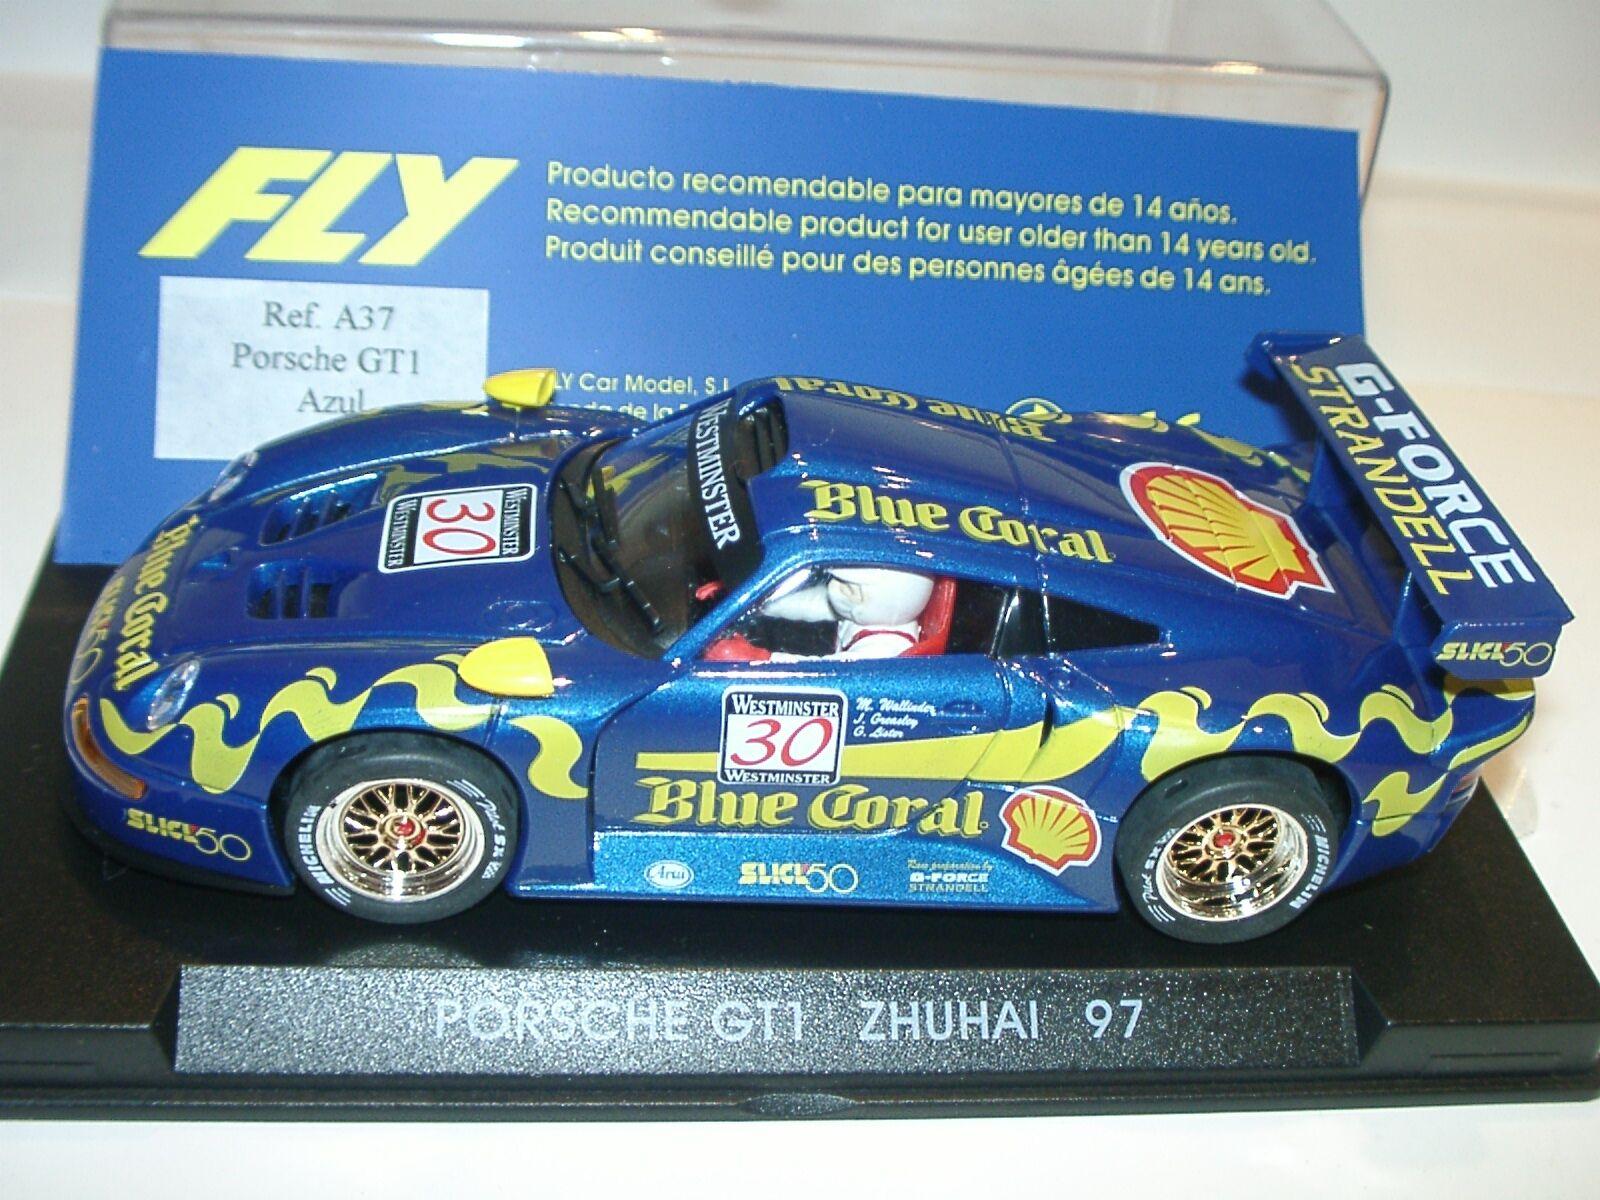 Sqvc) fliegen a37 porsche 911 gt1 Blau coral zhuai 1997 - slot 1  32 - skala